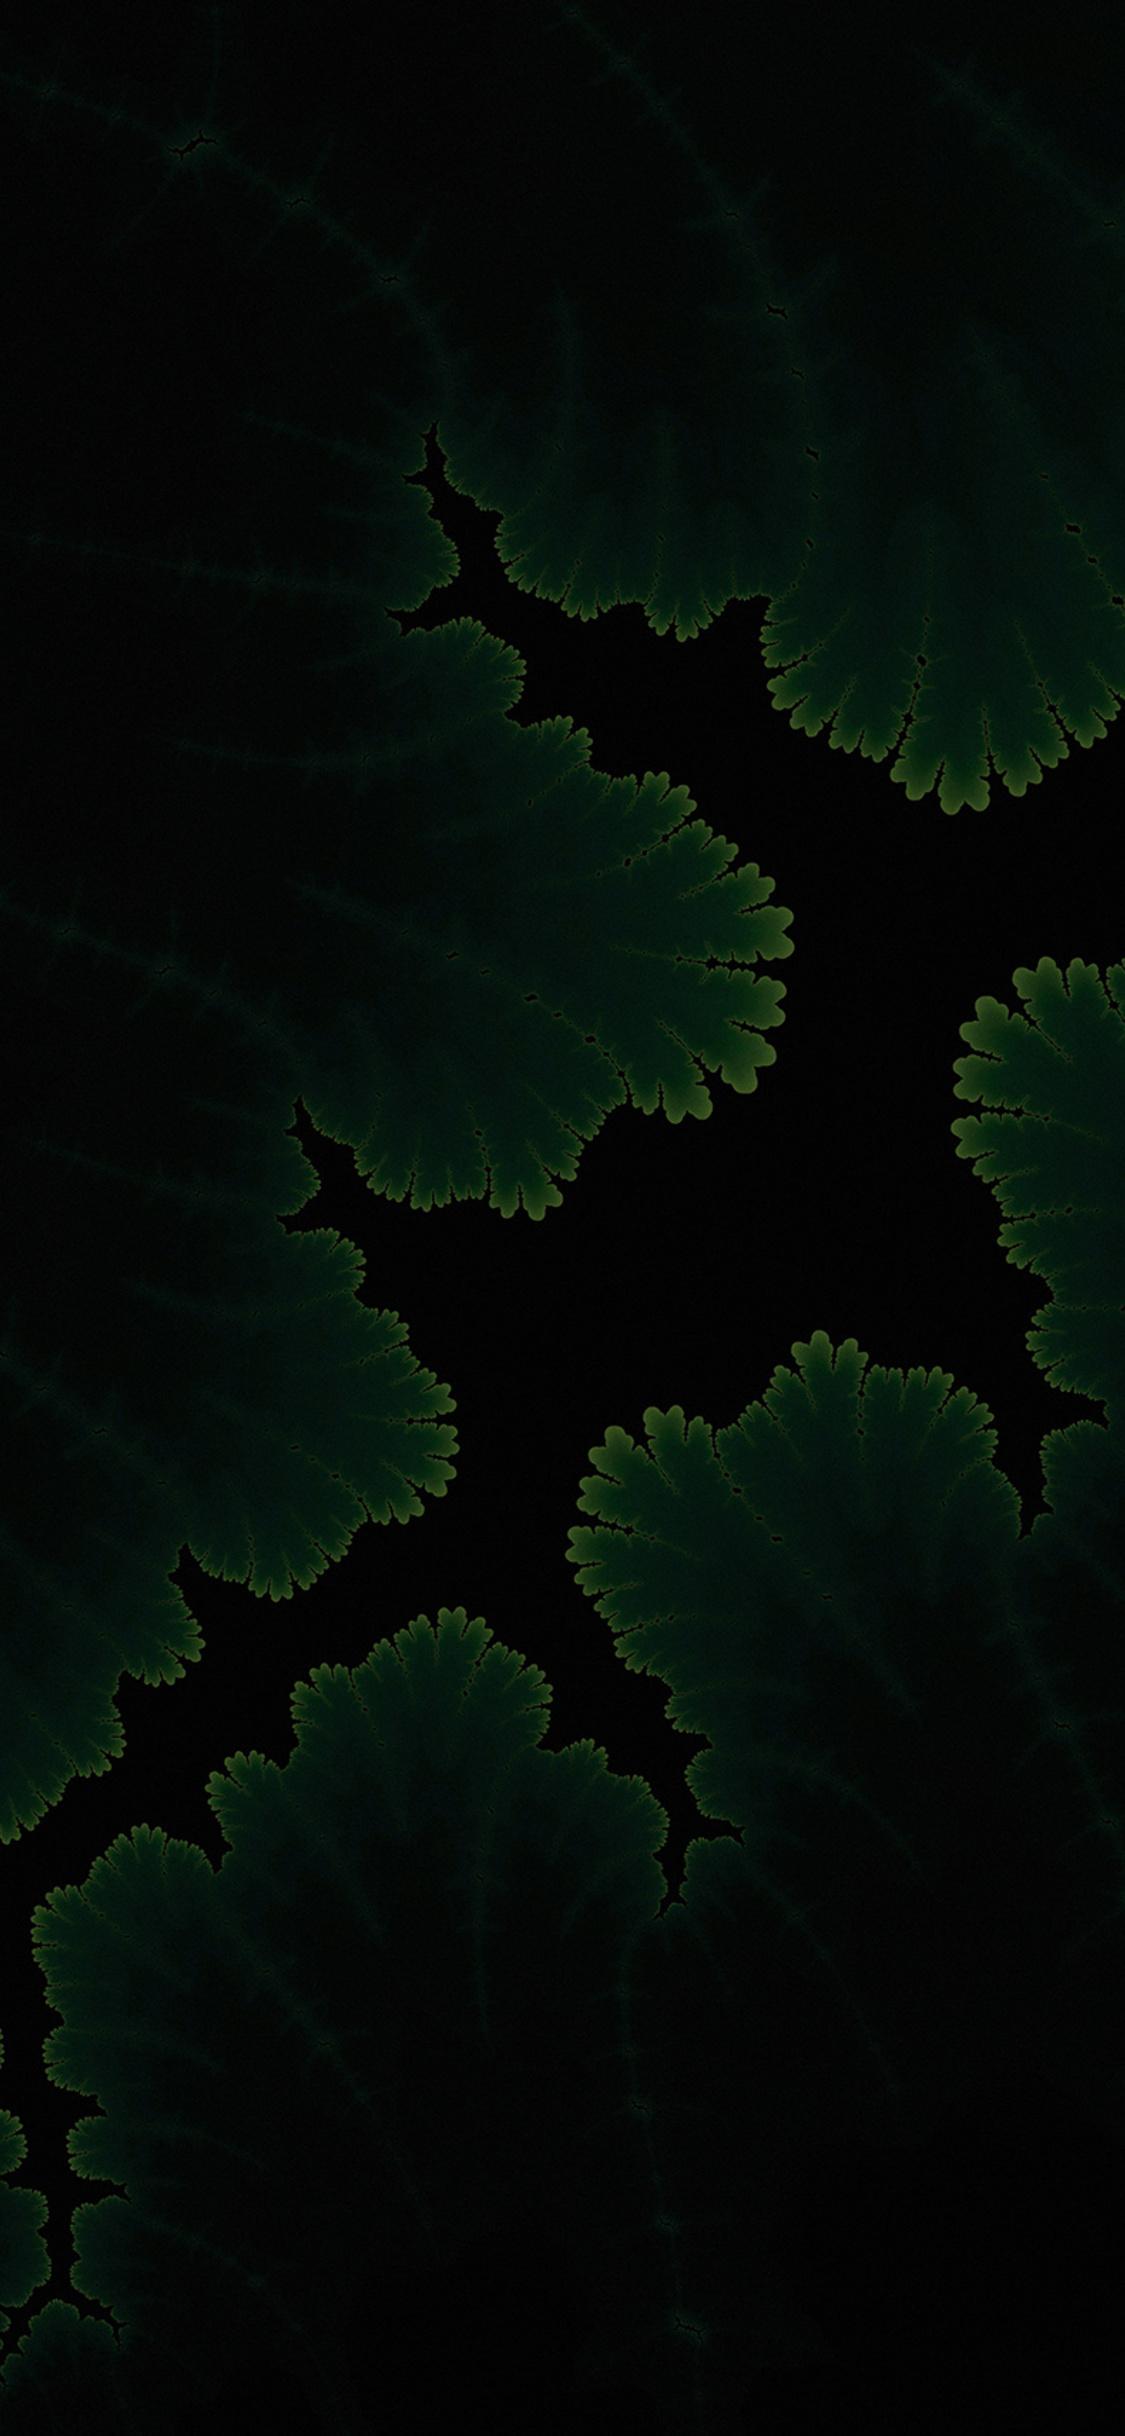 1125x2436 Green Plants Dark Amoled Iphone Xs Iphone 10